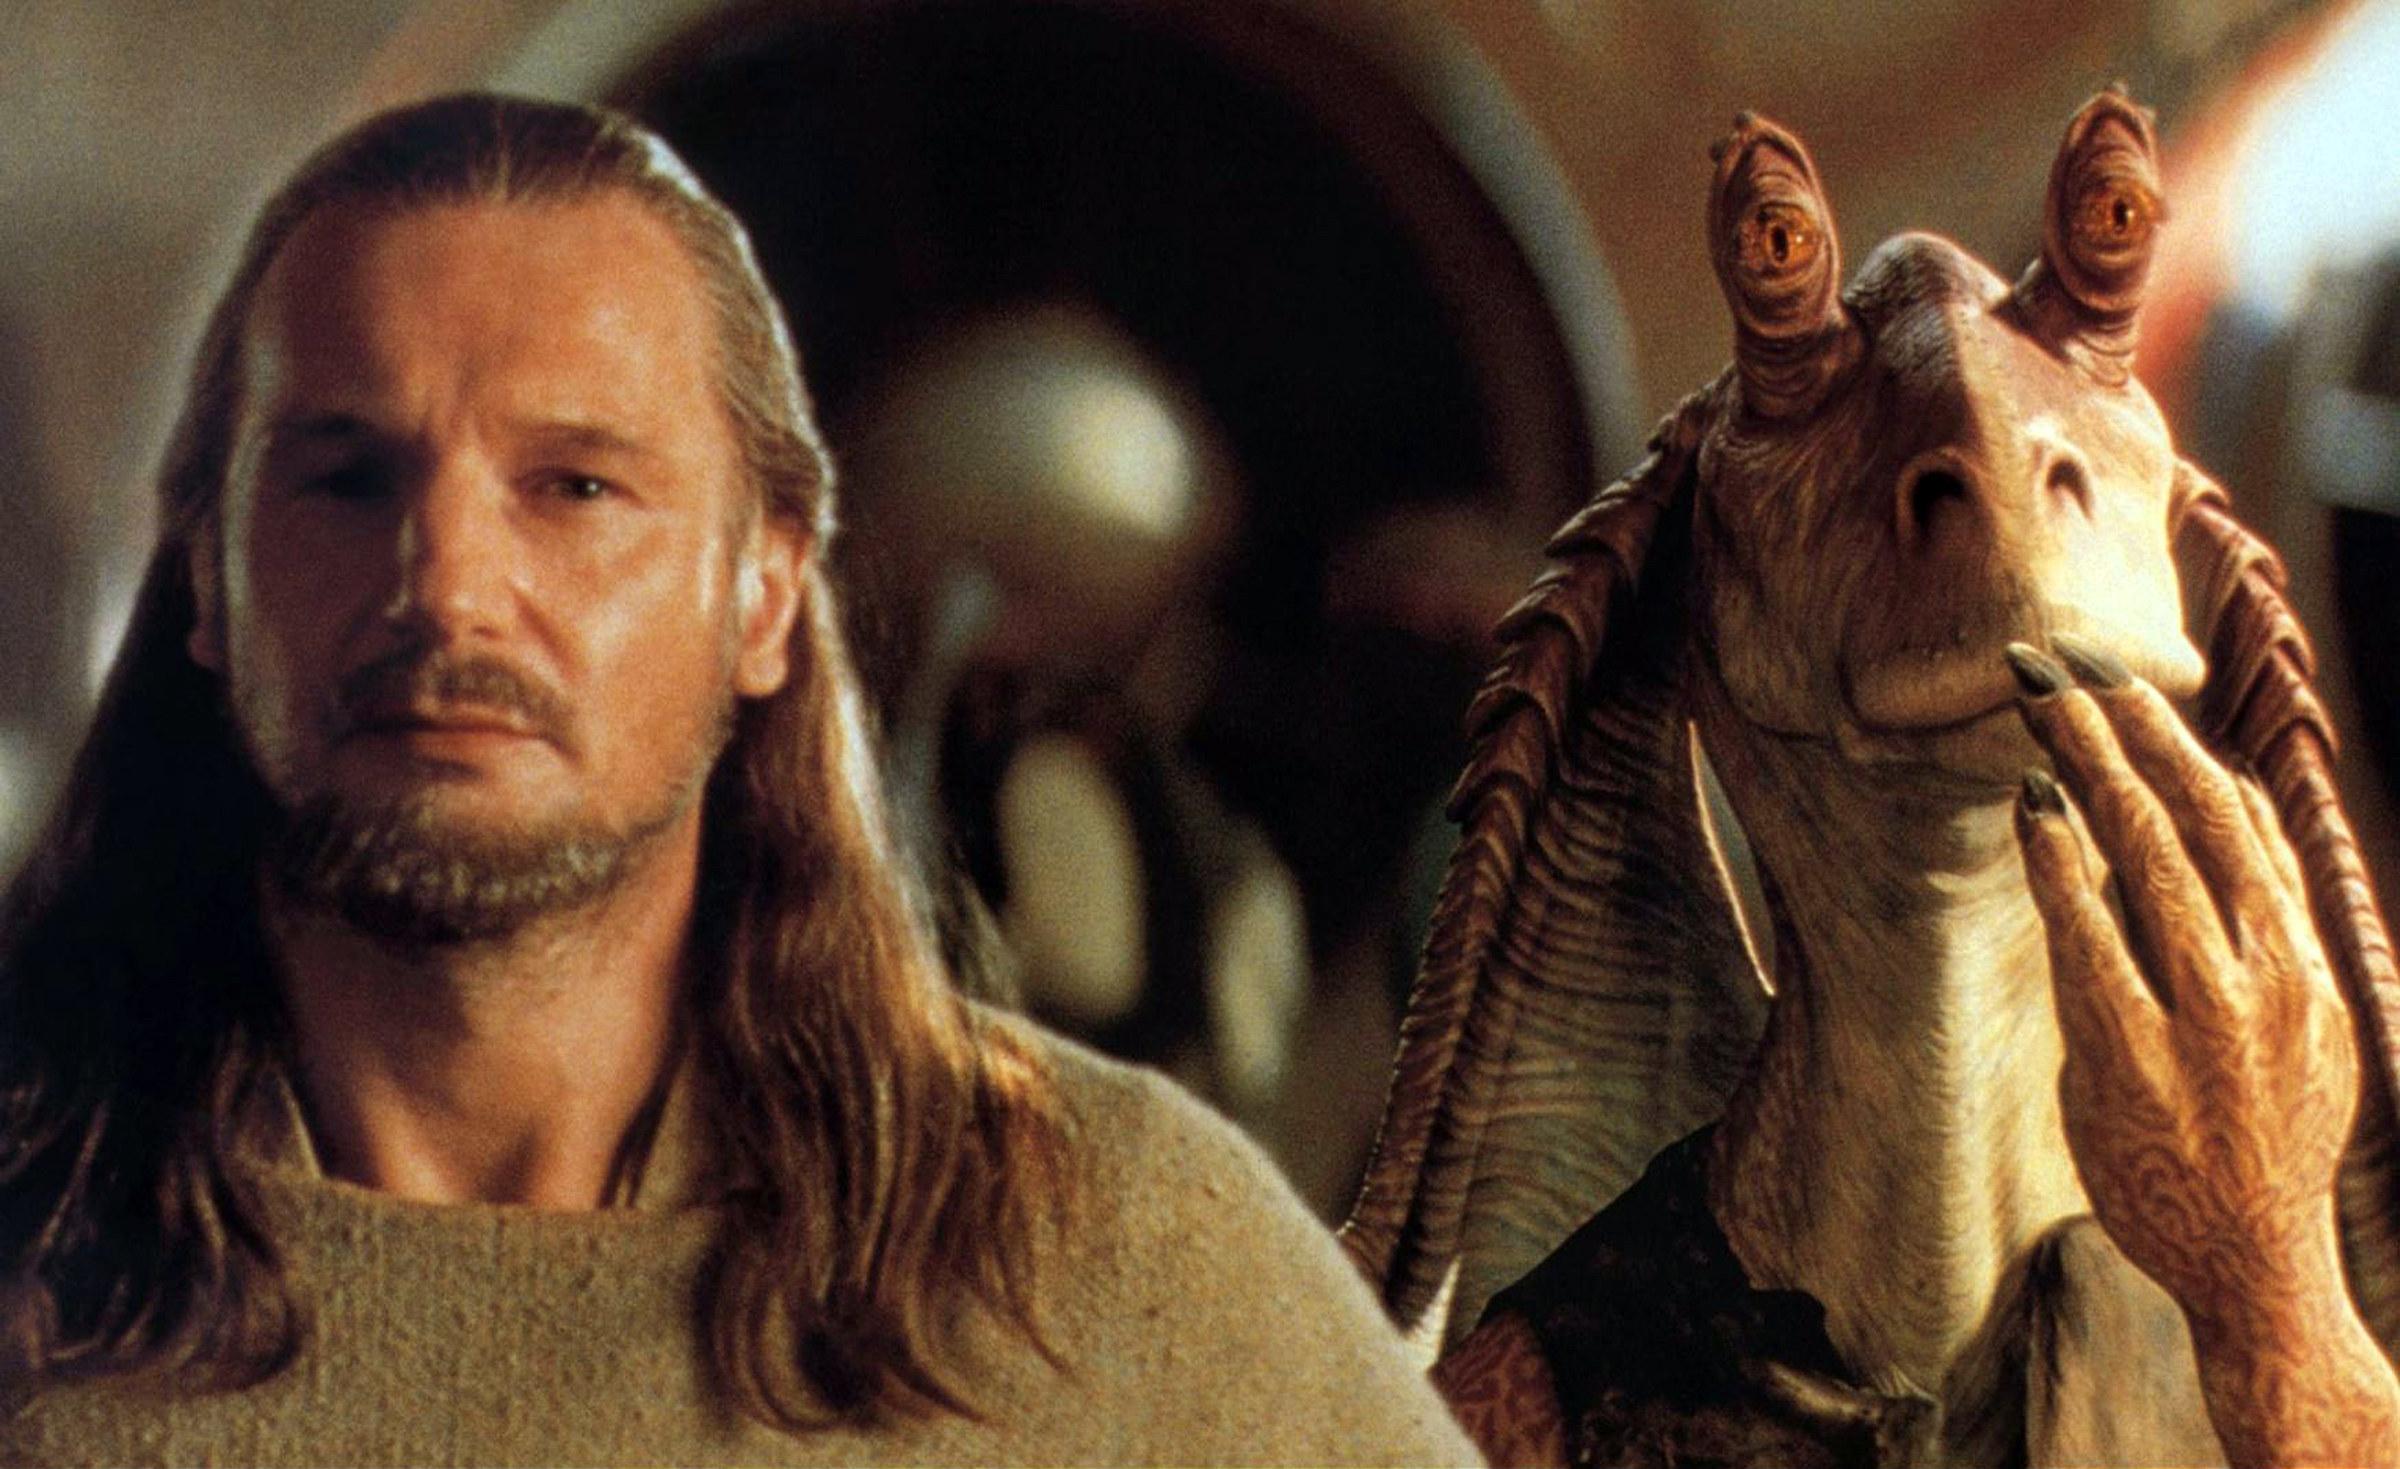 Liam Neeson looking annoyed at Jar Jar Binks.